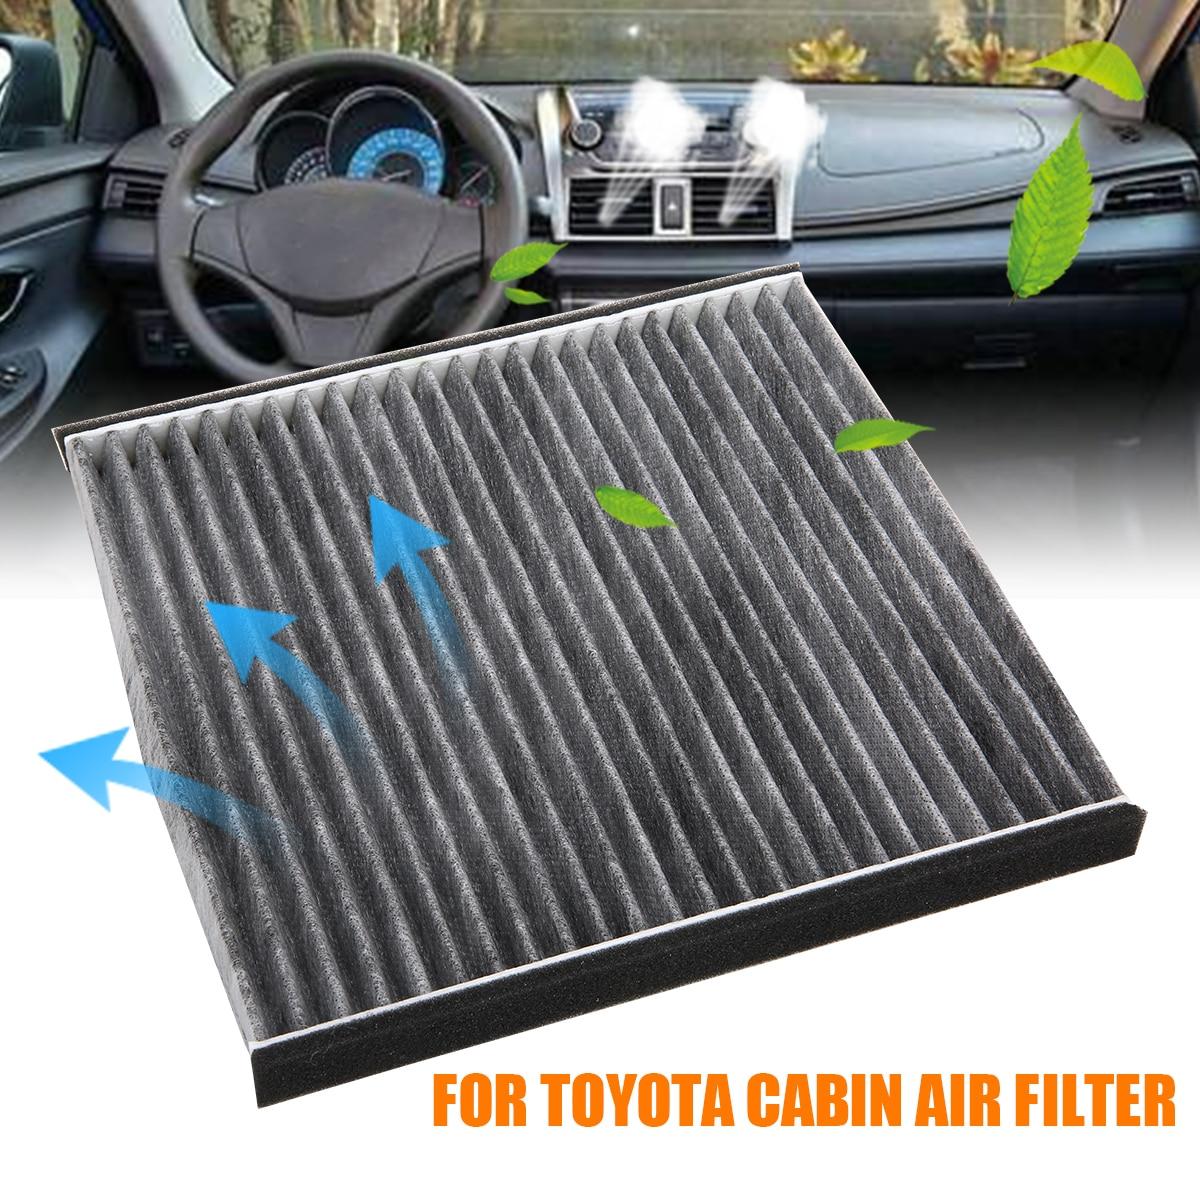 Clever Für Toyota 4 Runner Avalon Camry Corolla Cruiser 87139-33010 Gewidmet Luftfilter & Kabine Luftfilter 88568-0d520/ 8104300-008 Clear-Cut-Textur